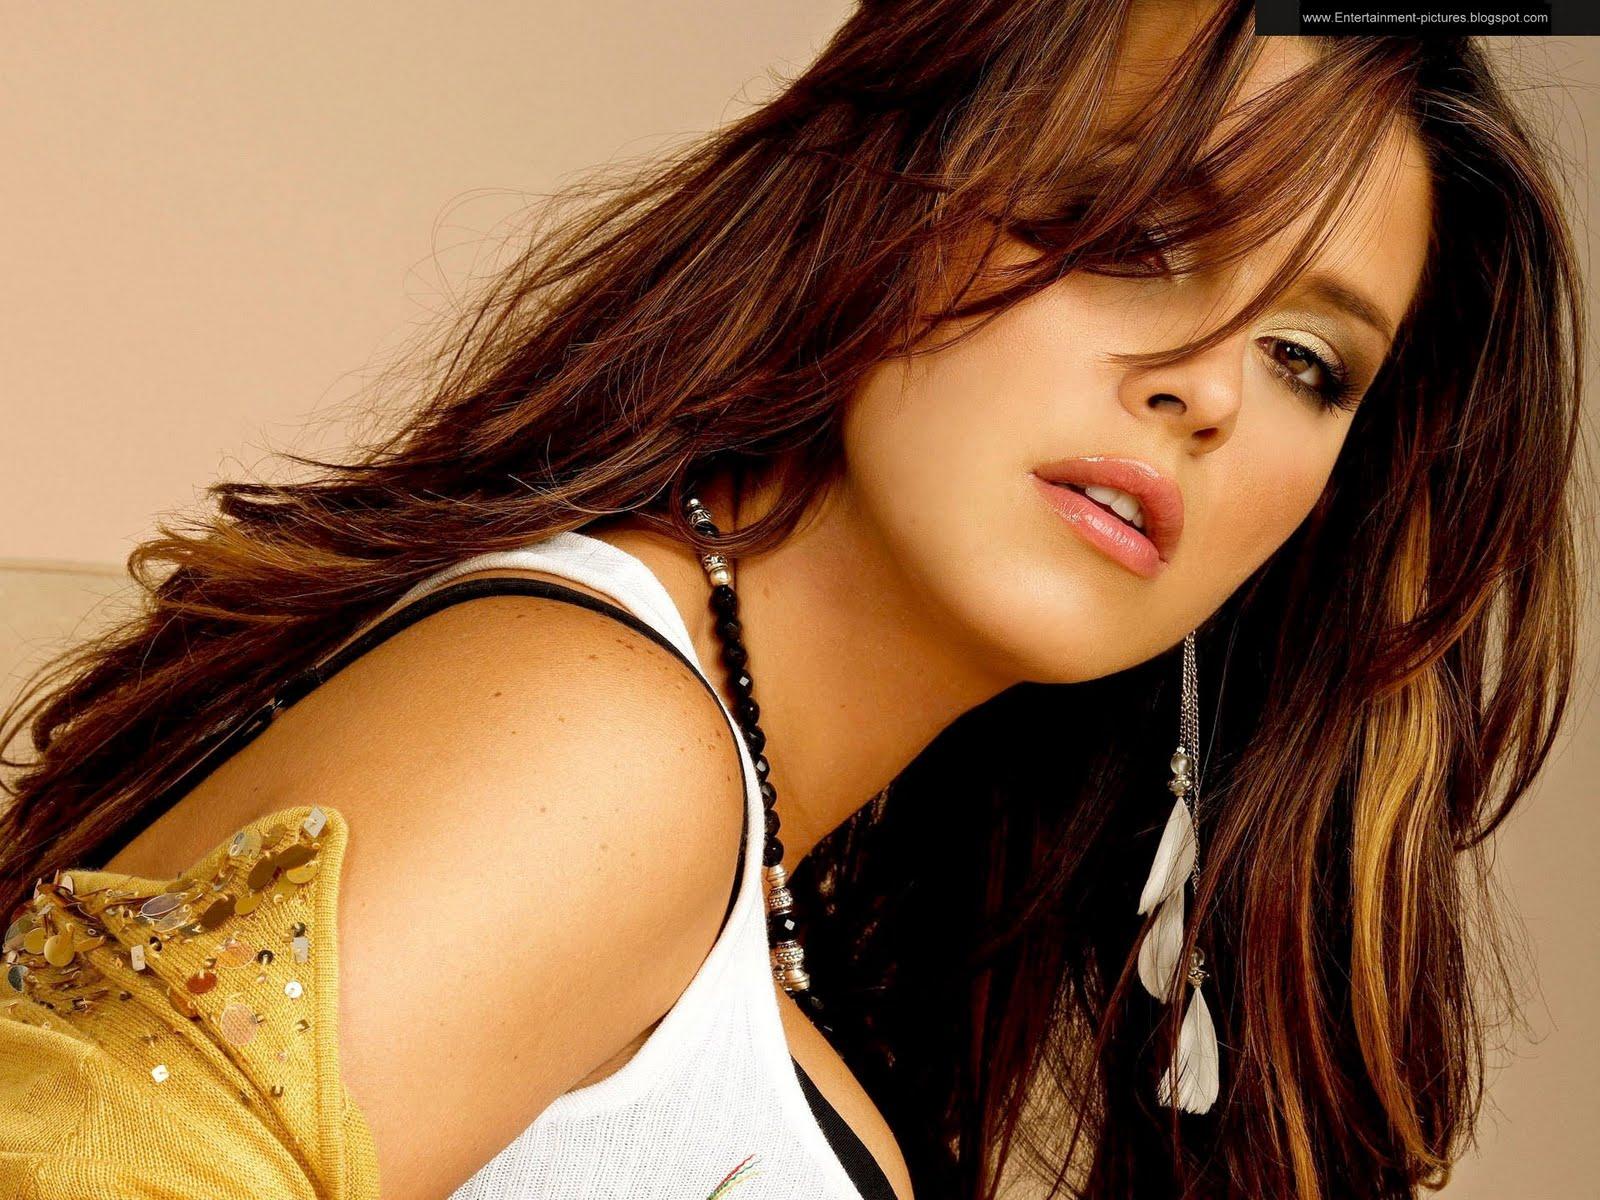 beautiful girls hd wallpapers | entertainment, hd wallpapeprs